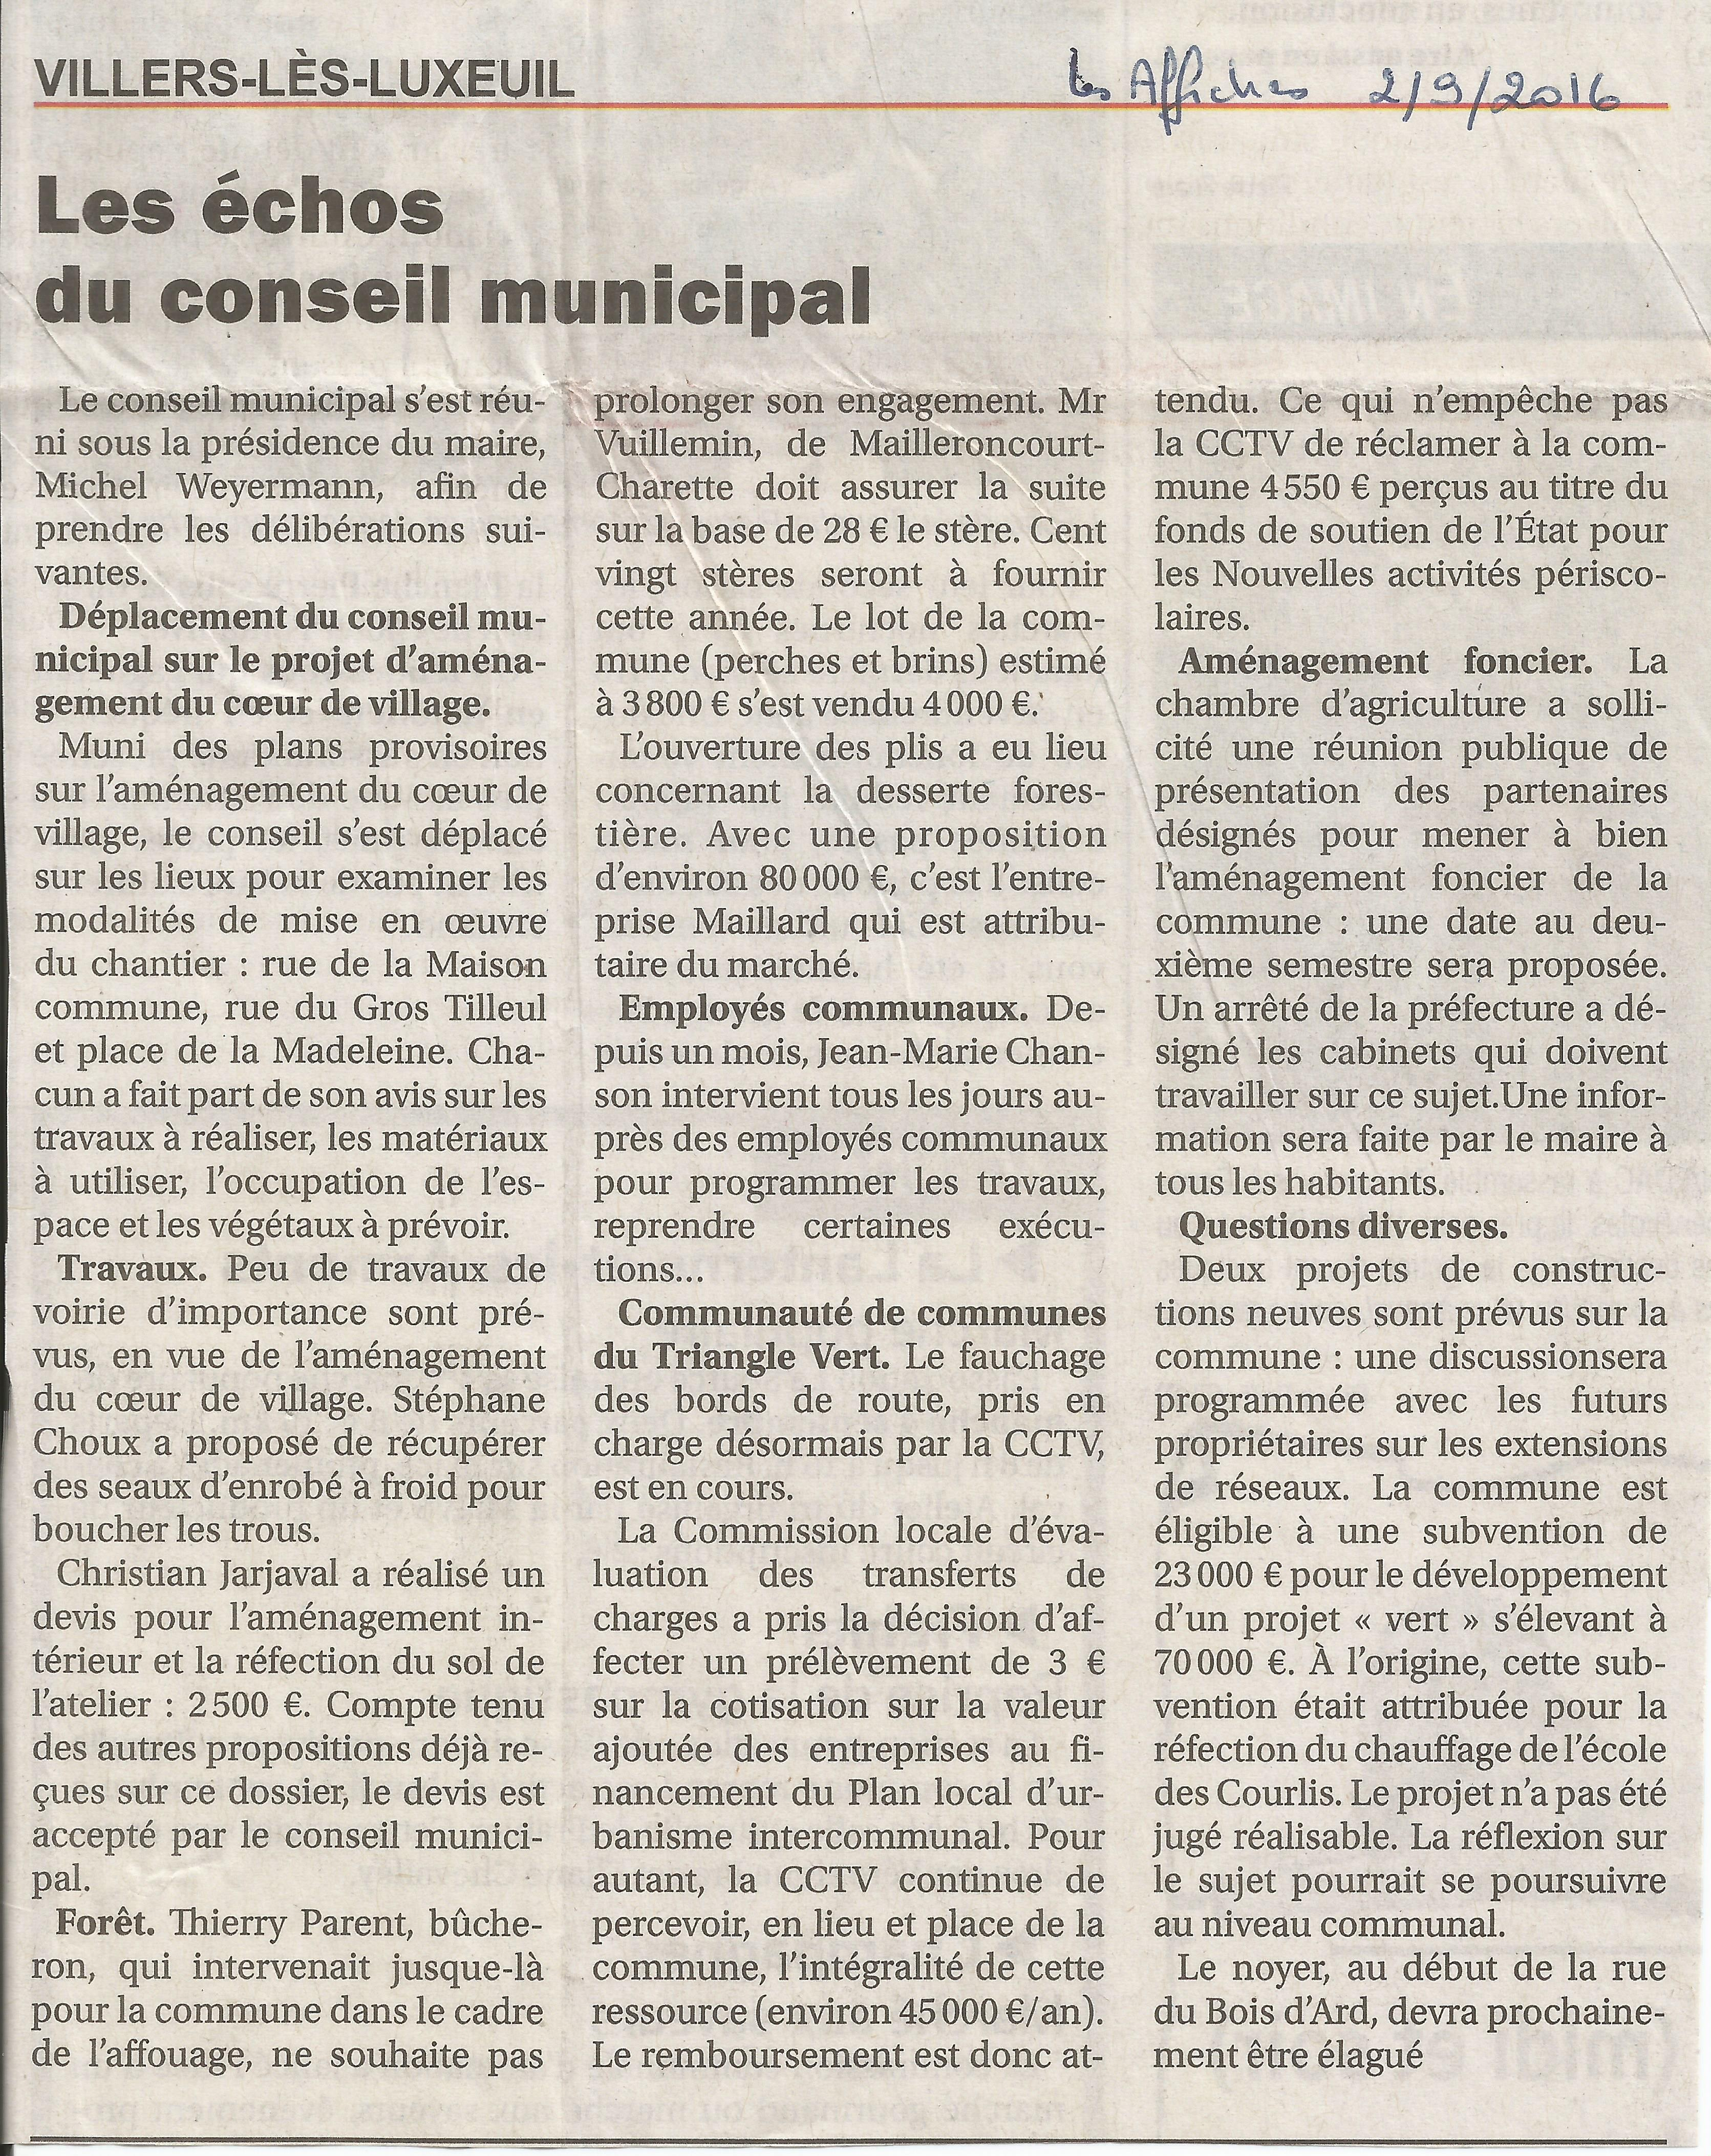 https://www.villers-les-luxeuil.com/projets/villers/files/images/2016_Mairie/Presse/2016_09_02.jpg